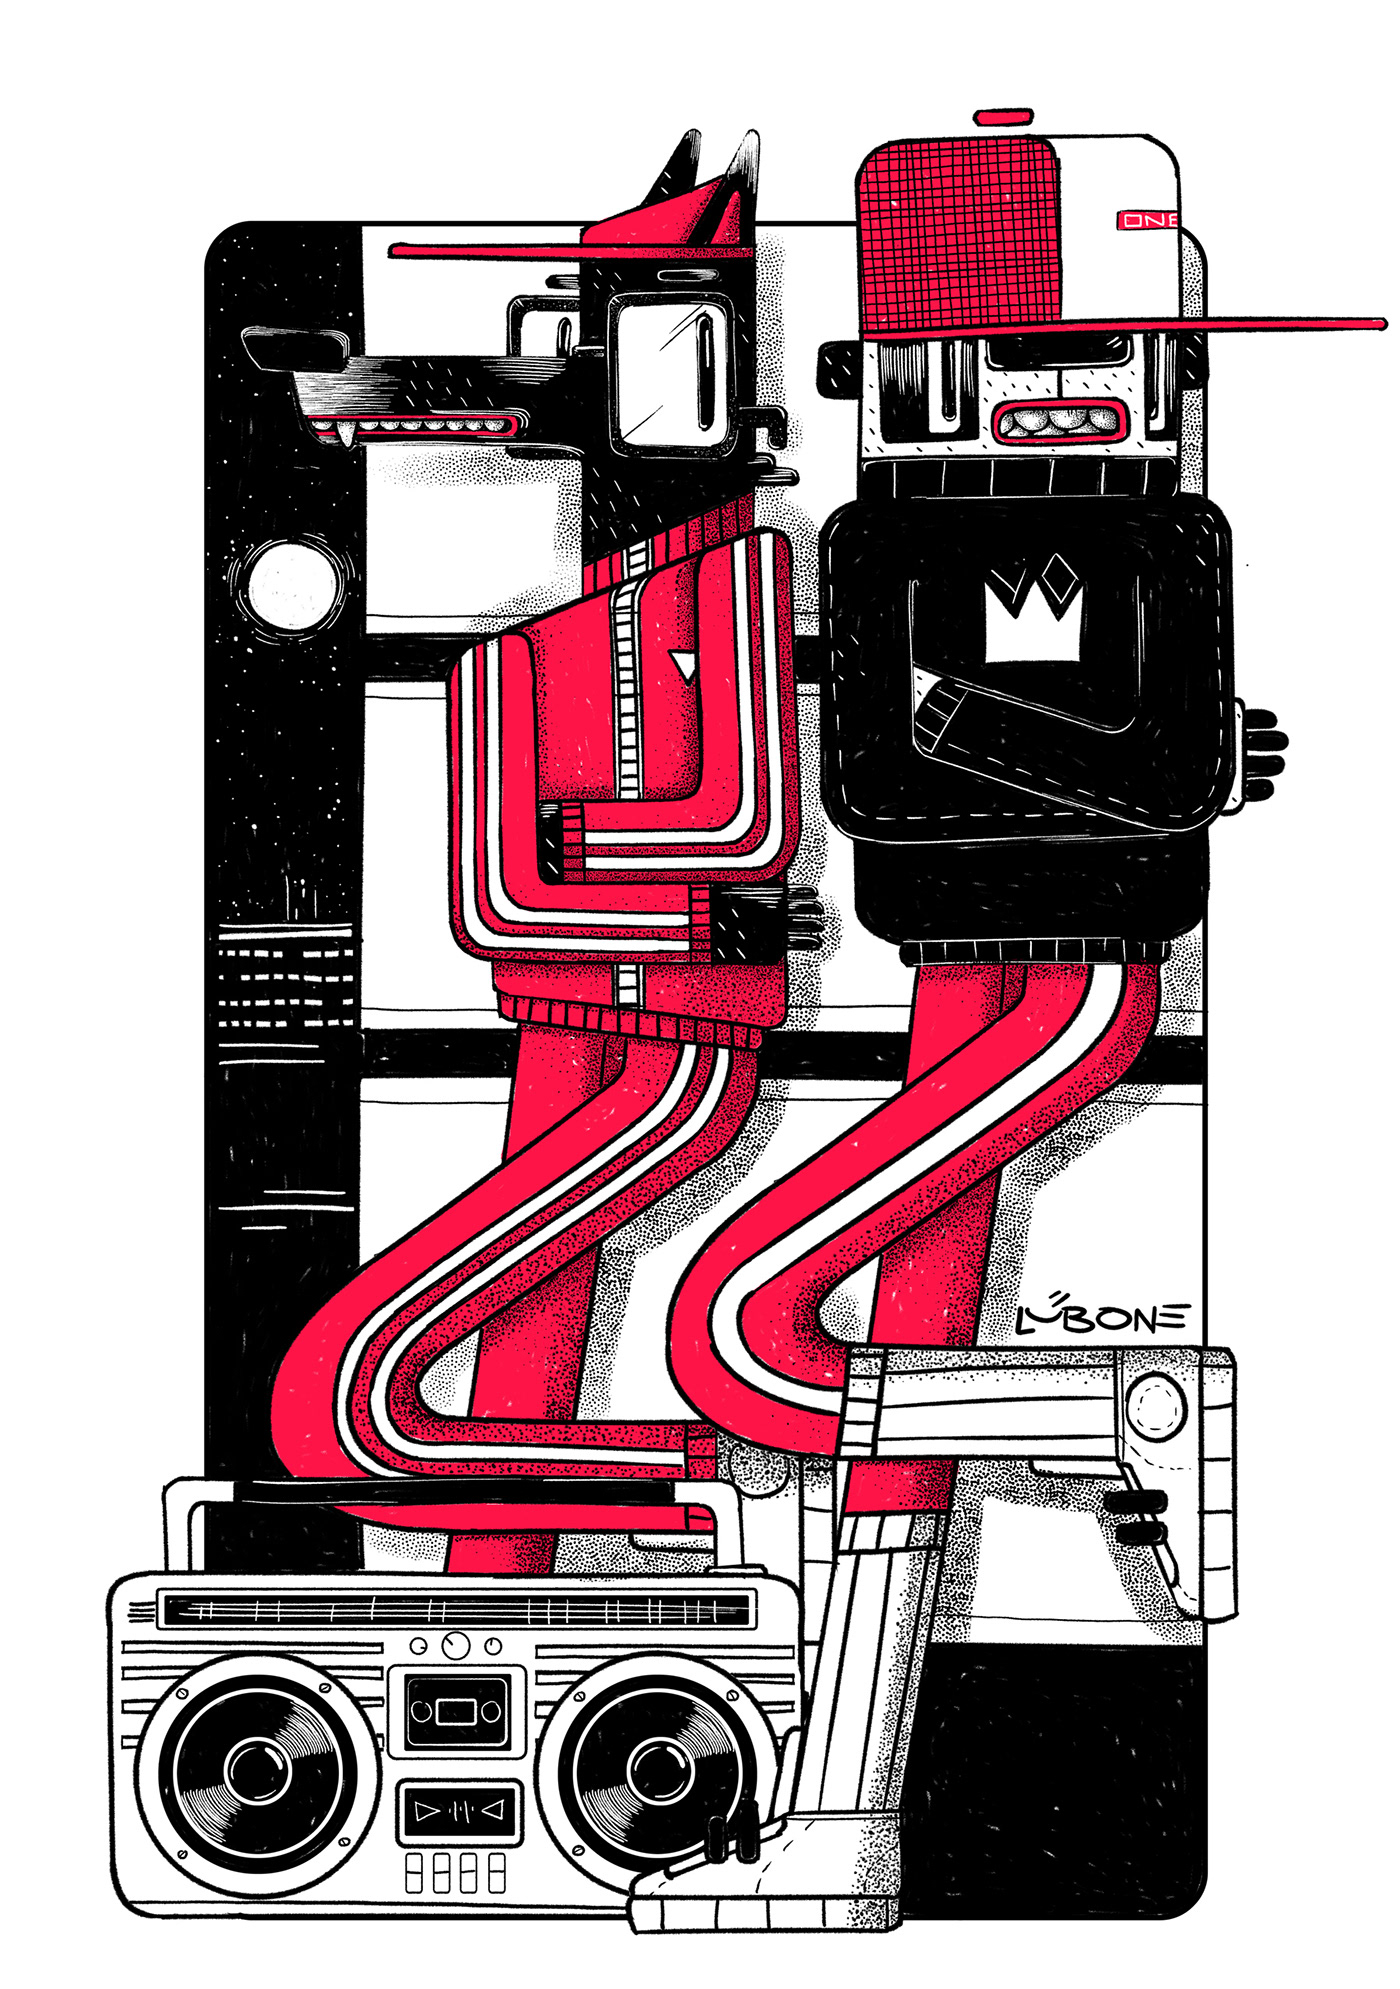 Lub One Иллюстрация, Цифровое искусство, Дизайн персонажей (3).jpg